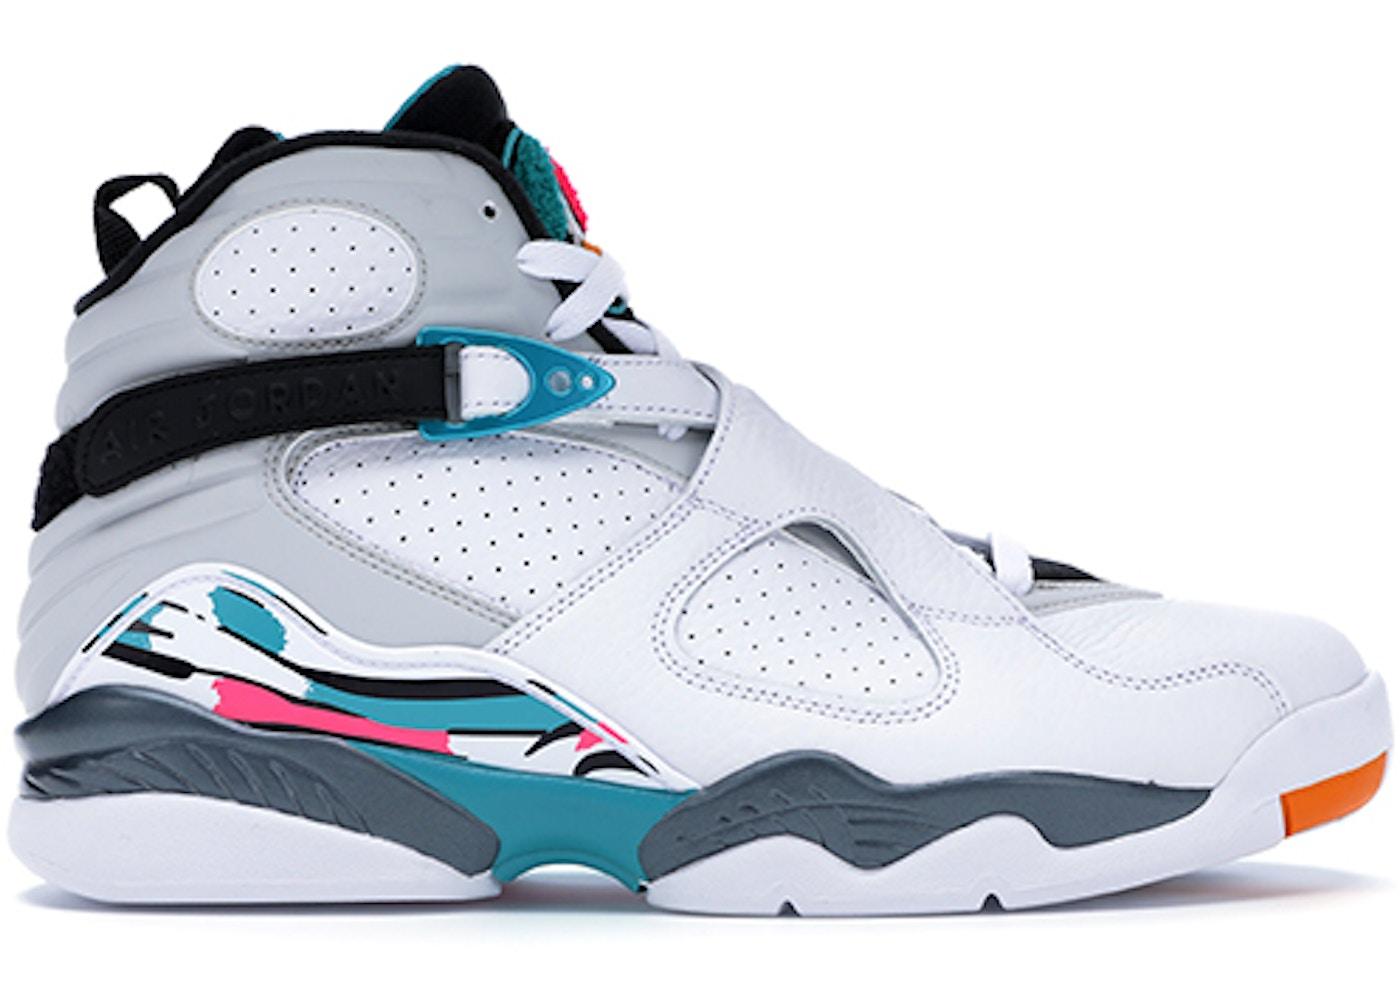 los angeles b750f 6fc4a Buy Air Jordan 8 Shoes & Deadstock Sneakers